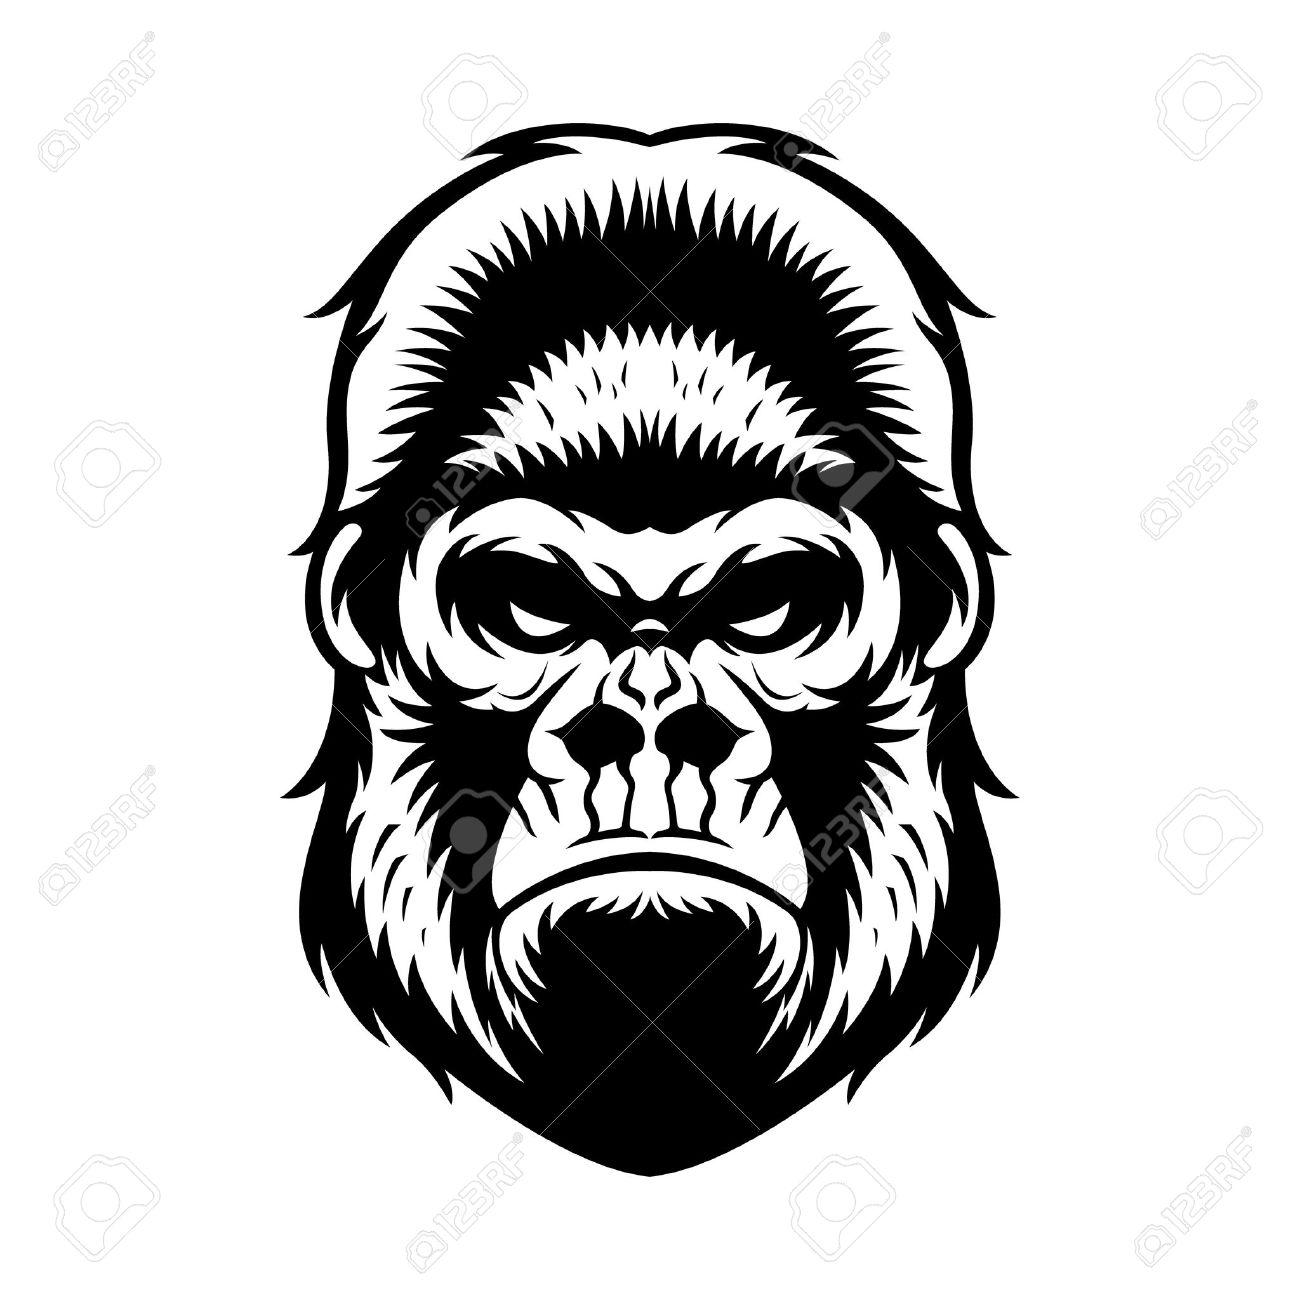 1300x1300 Gorilla Head Vector Graphic Illustration Black And White Royalty